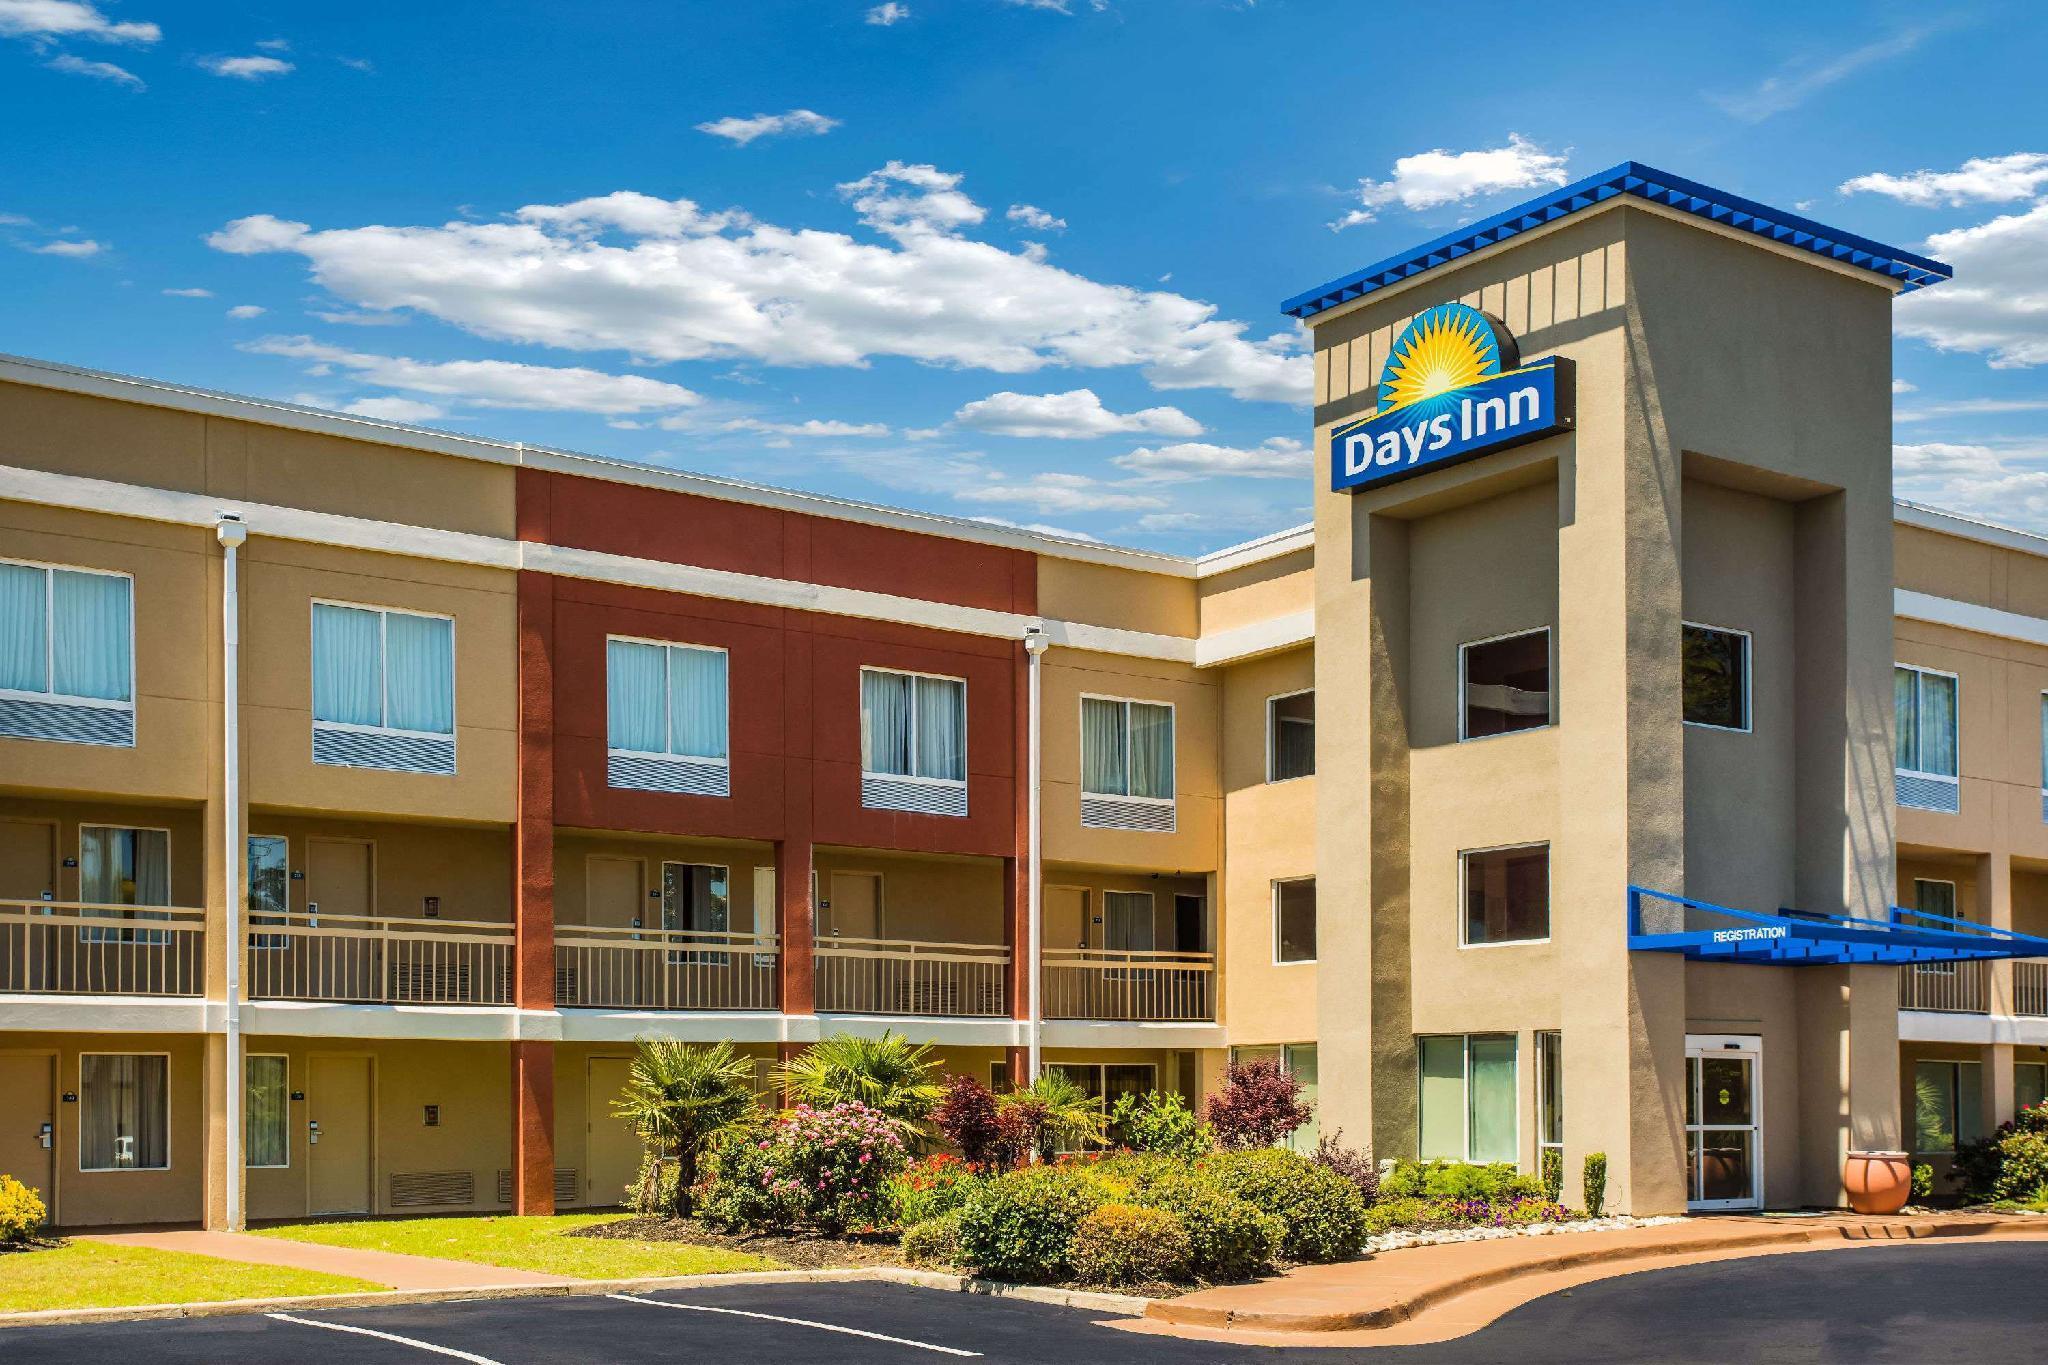 Days Inn By Wyndham Florence Near Civic Center